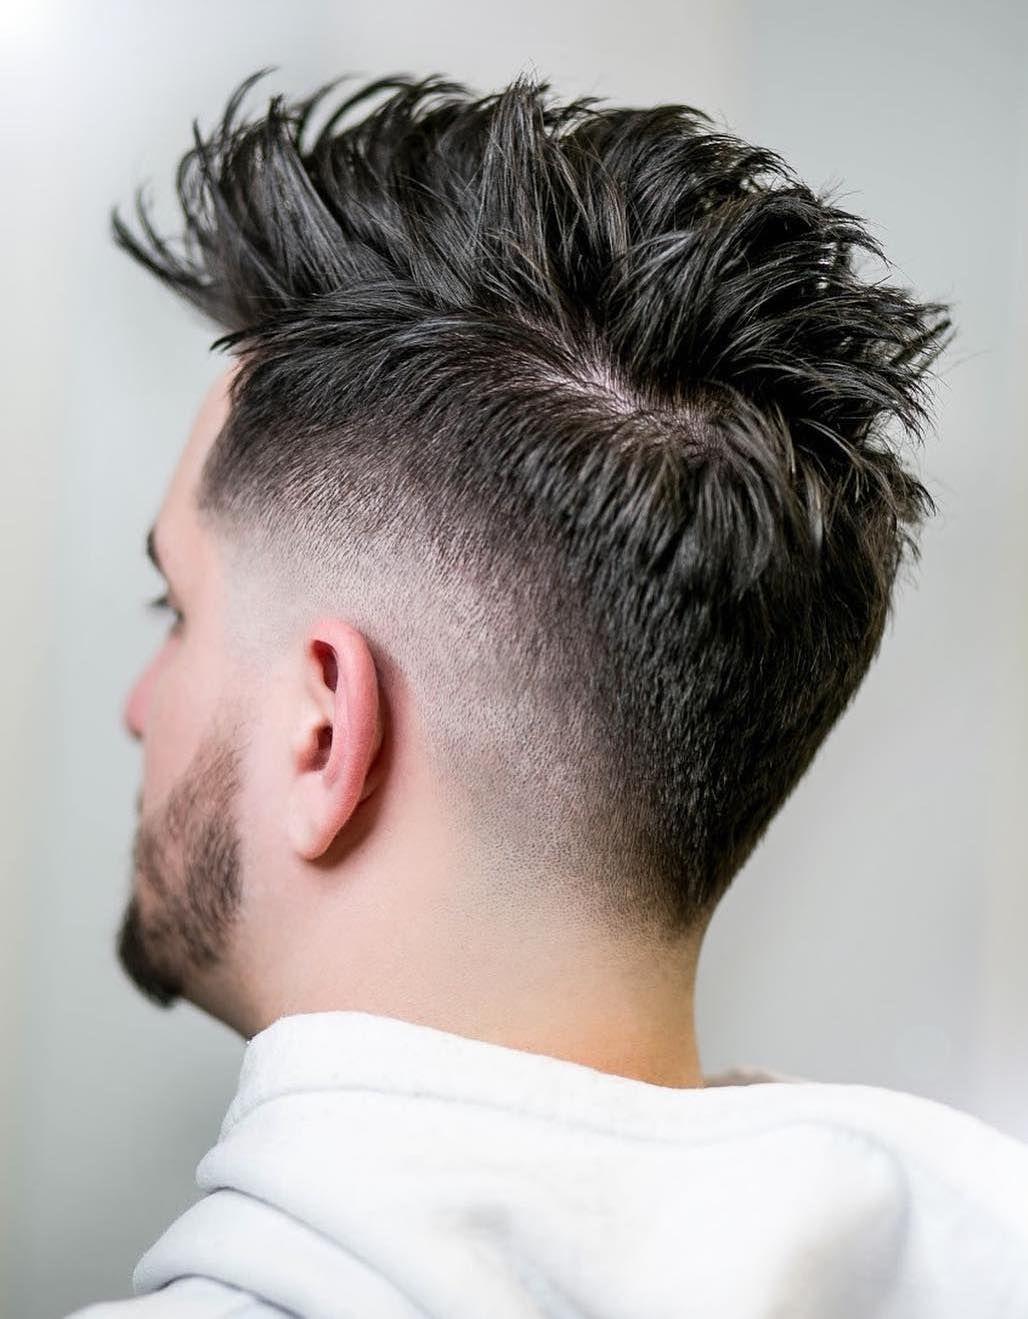 20 Drop Fade Haircuts Ideas New Twist On A Classic Drop Fade Haircut Fade Haircut Types Of Fade Haircut